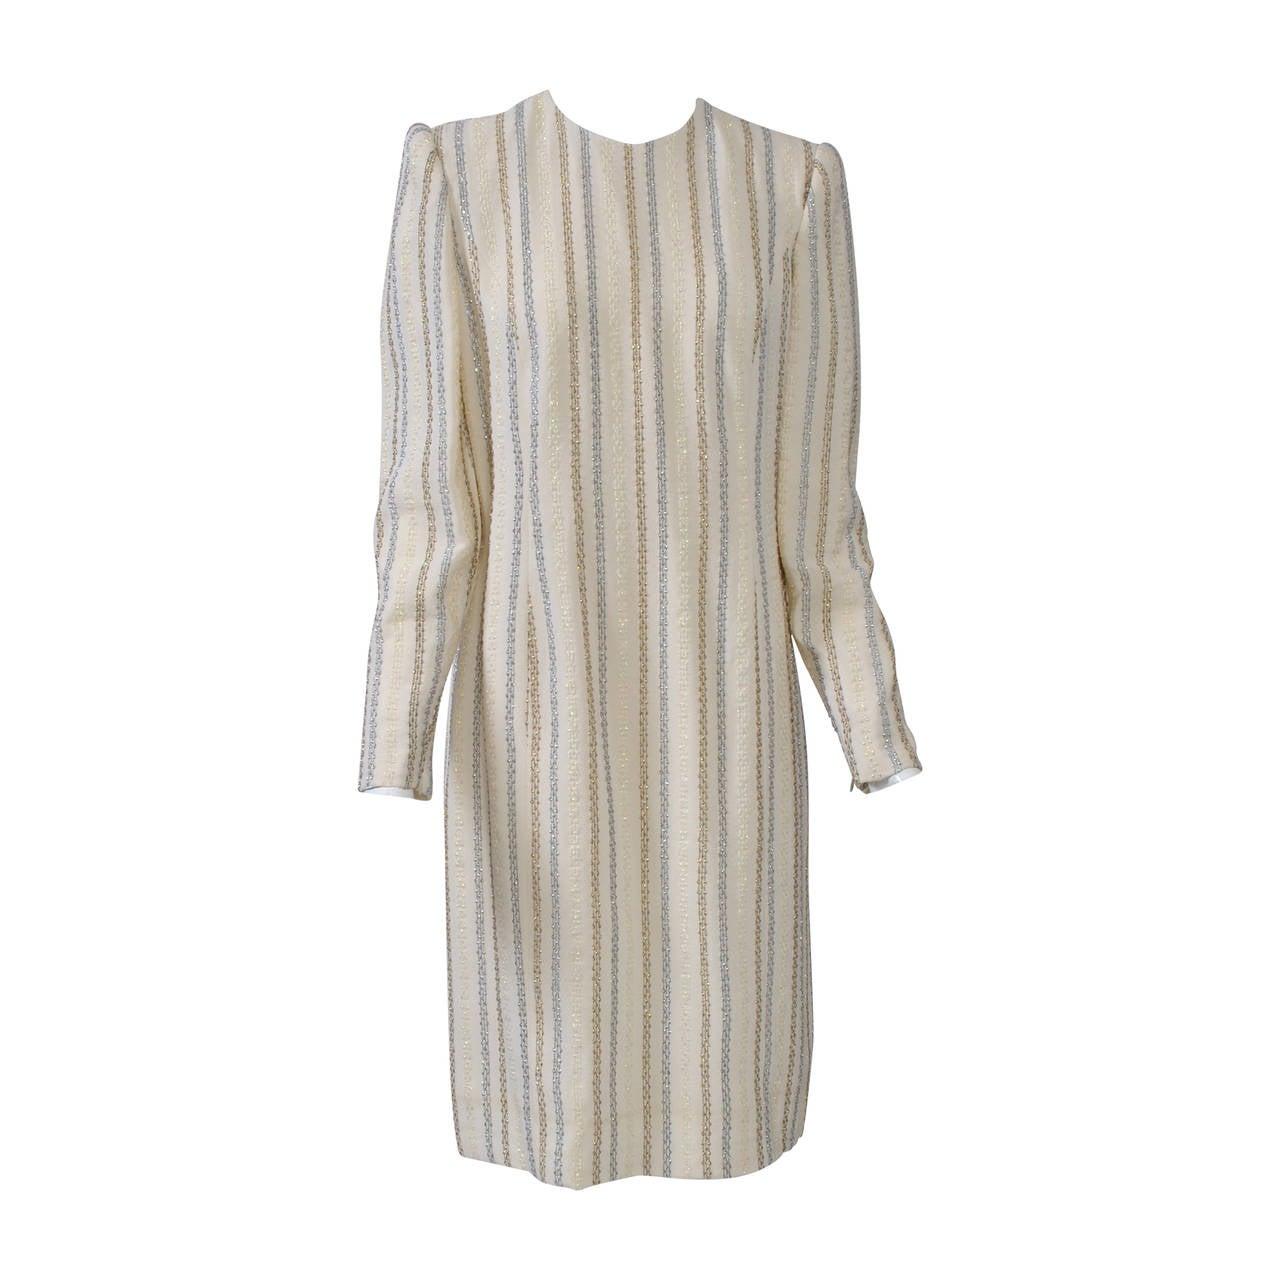 Carolina Herrera Ivory and Metallic Dress For Sale